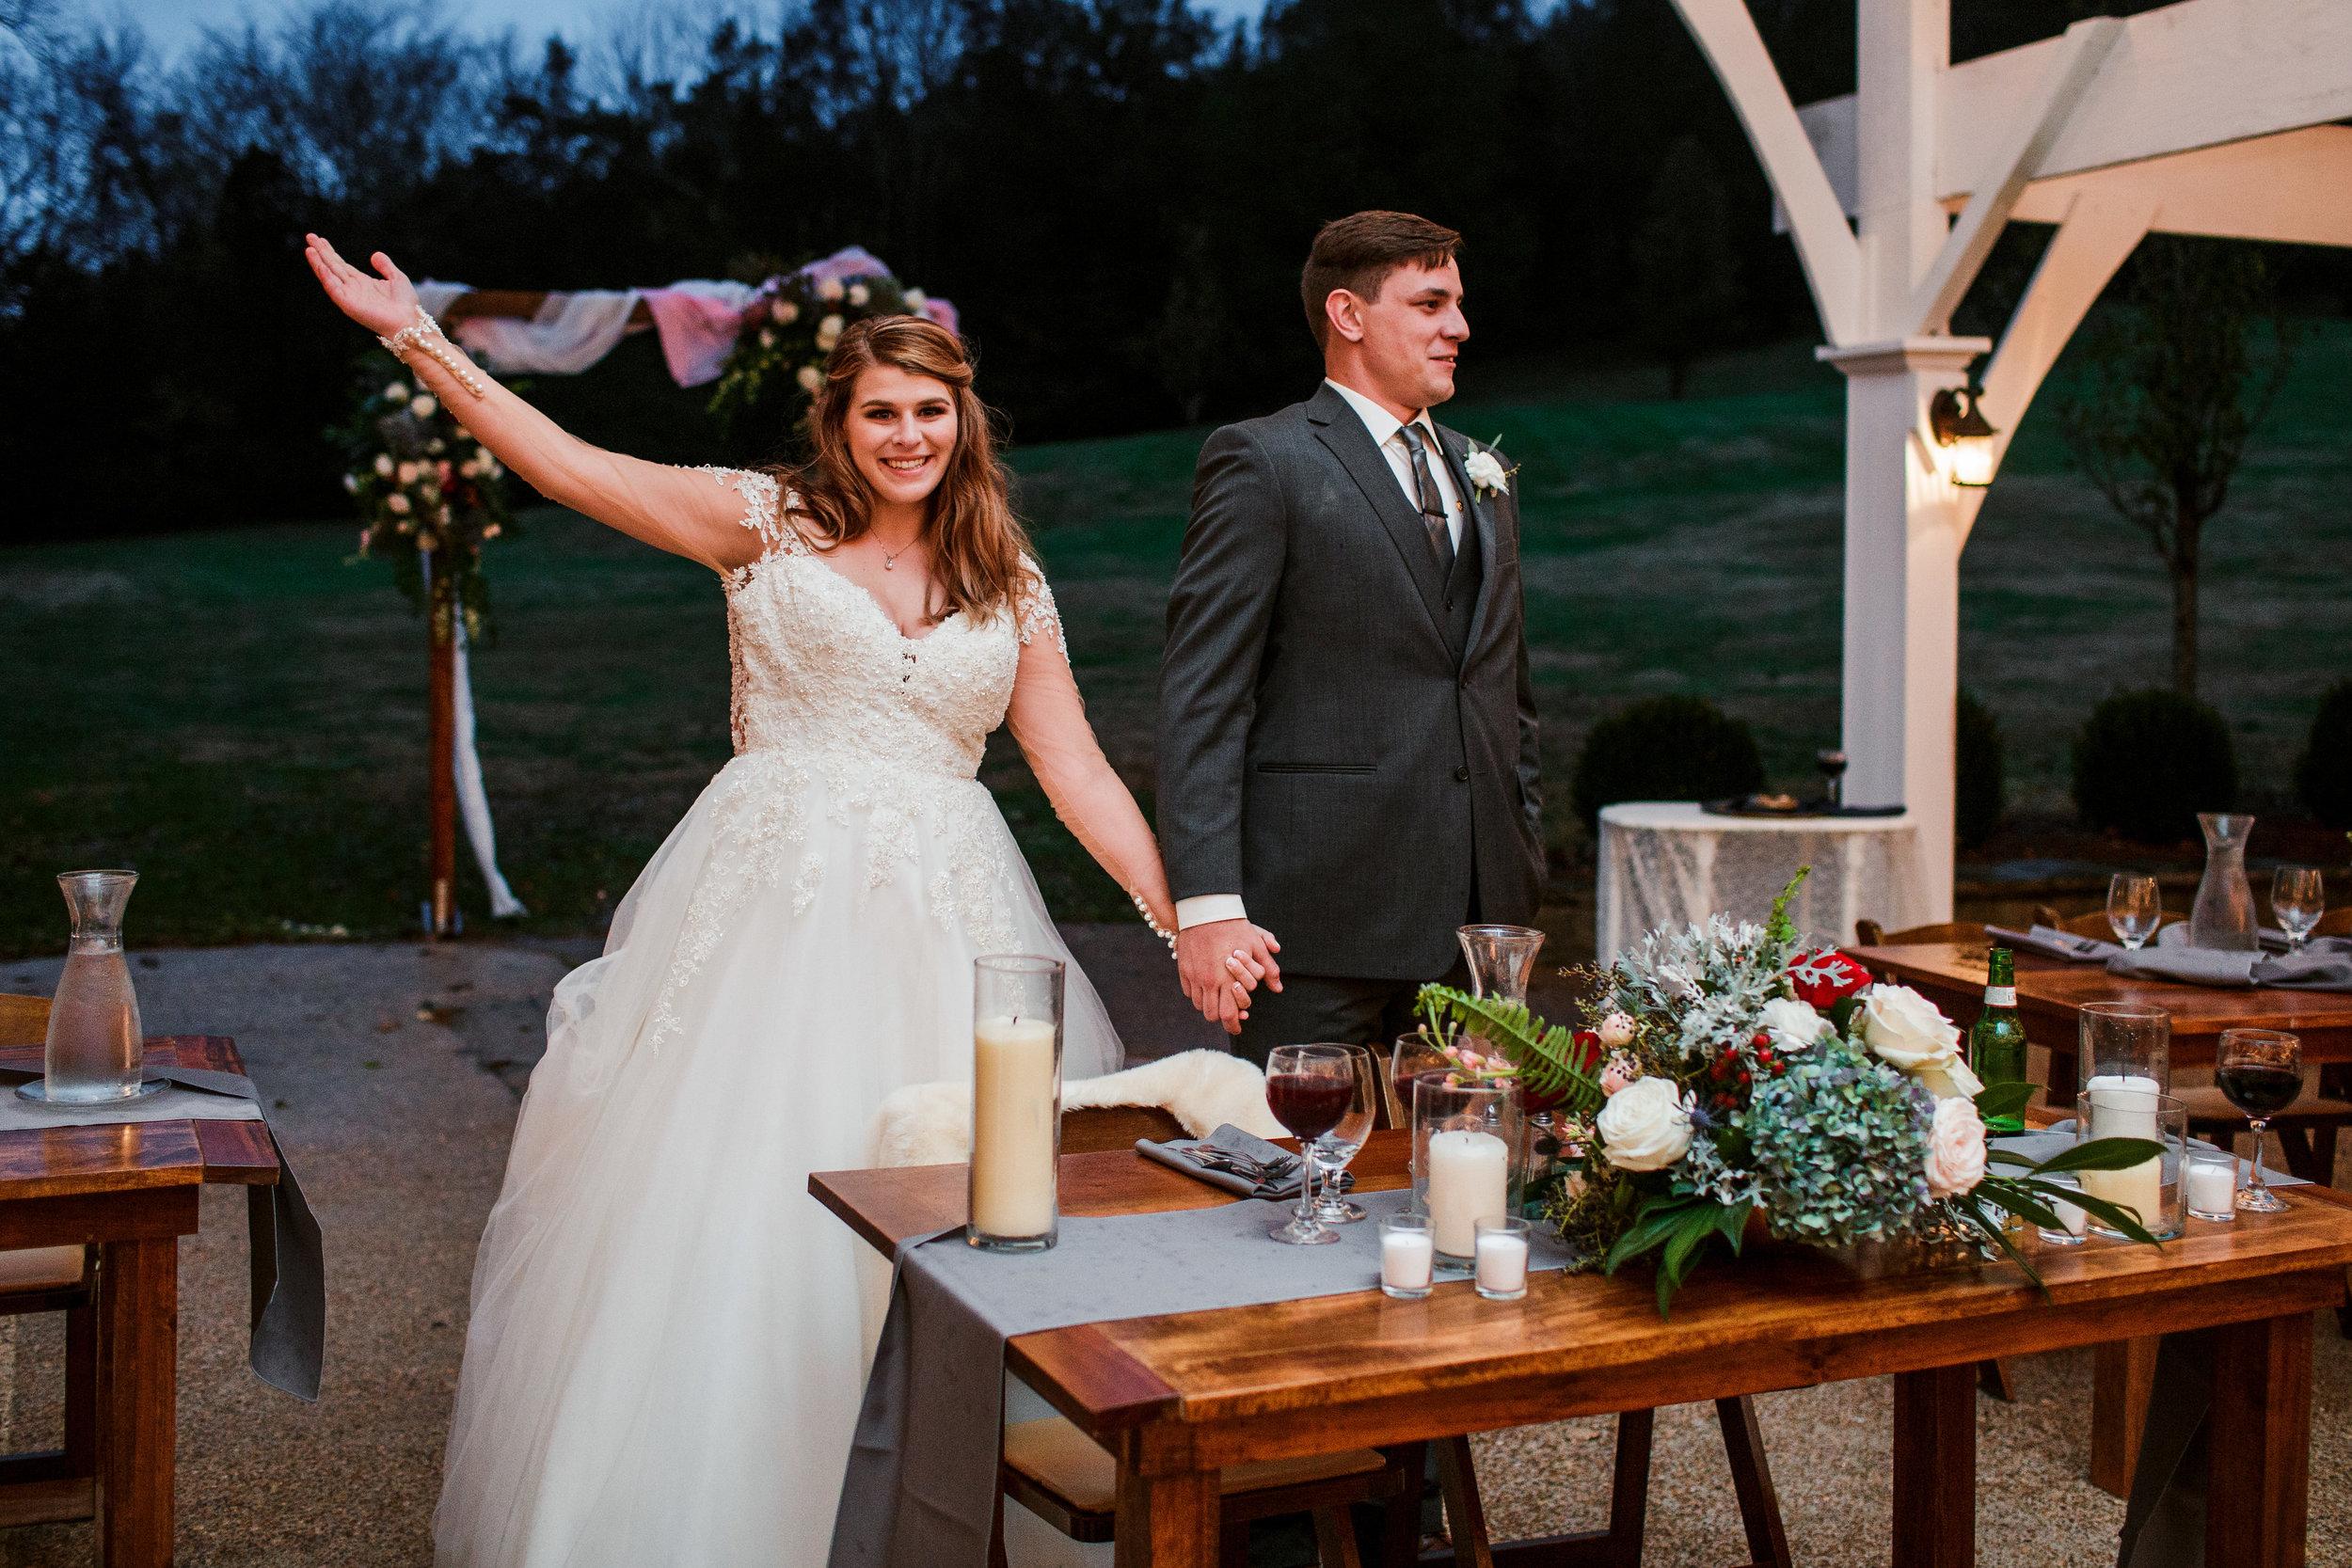 Cedarwood-Nashville-Wedding-Photographers 43.jpg